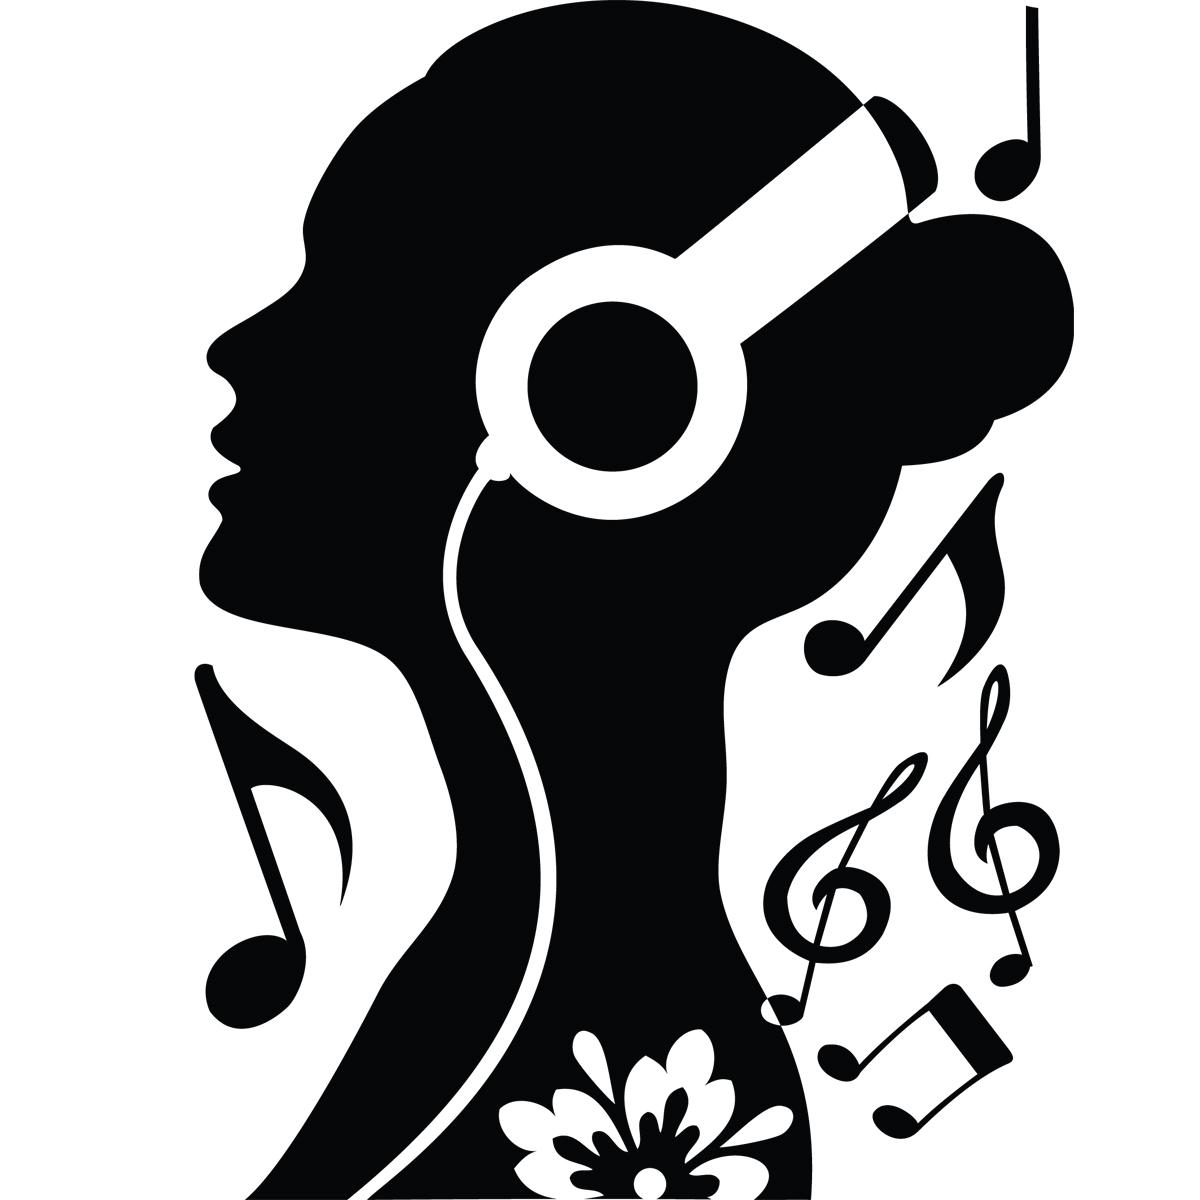 stickers muraux musique sticker fille avec casque ambiance. Black Bedroom Furniture Sets. Home Design Ideas